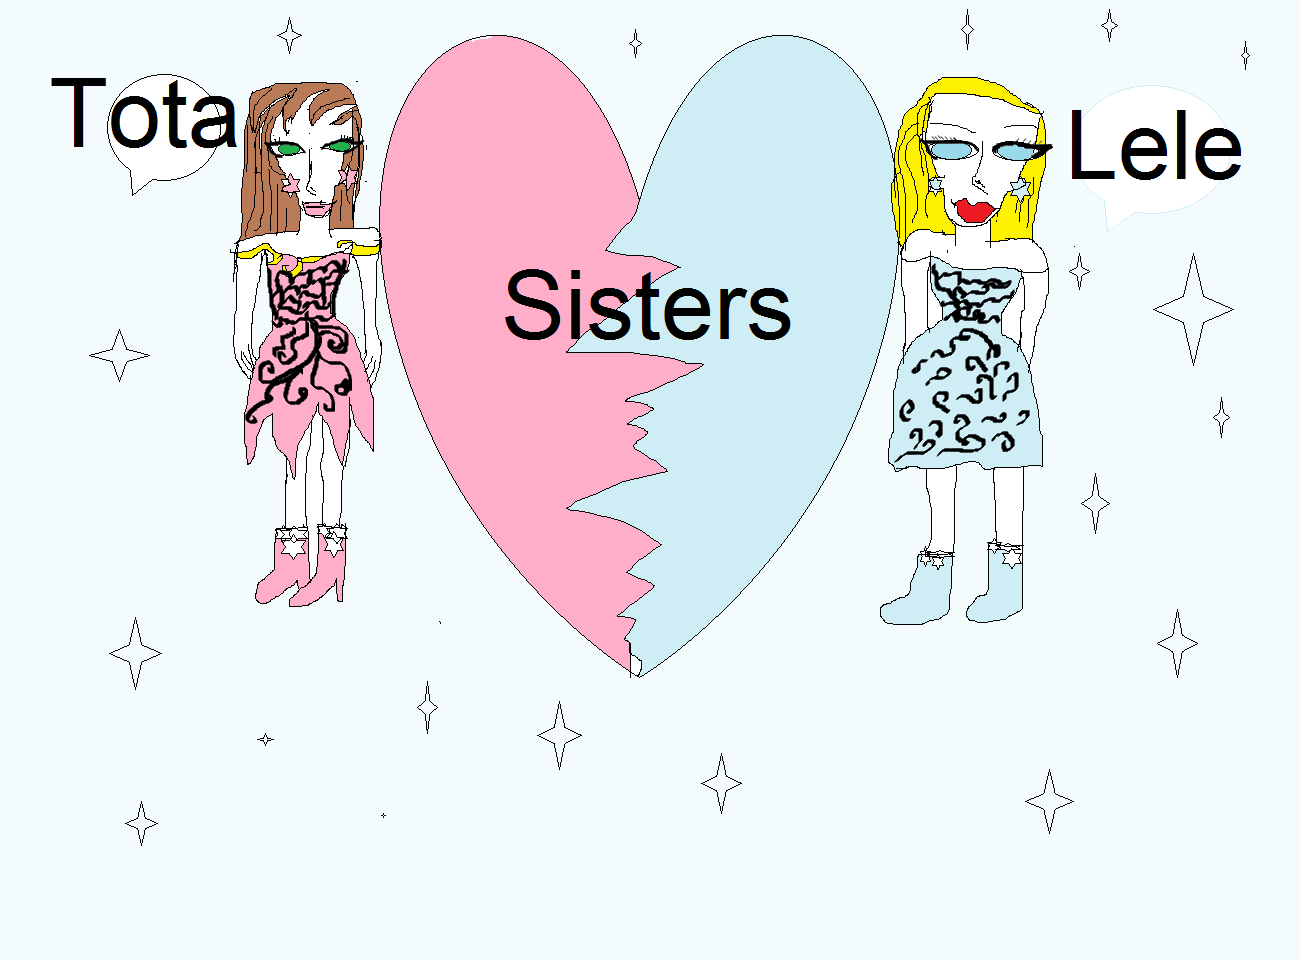 Sisters by shaimaa shbib - Illustrated by shaimaa shubib - Ourboox.com